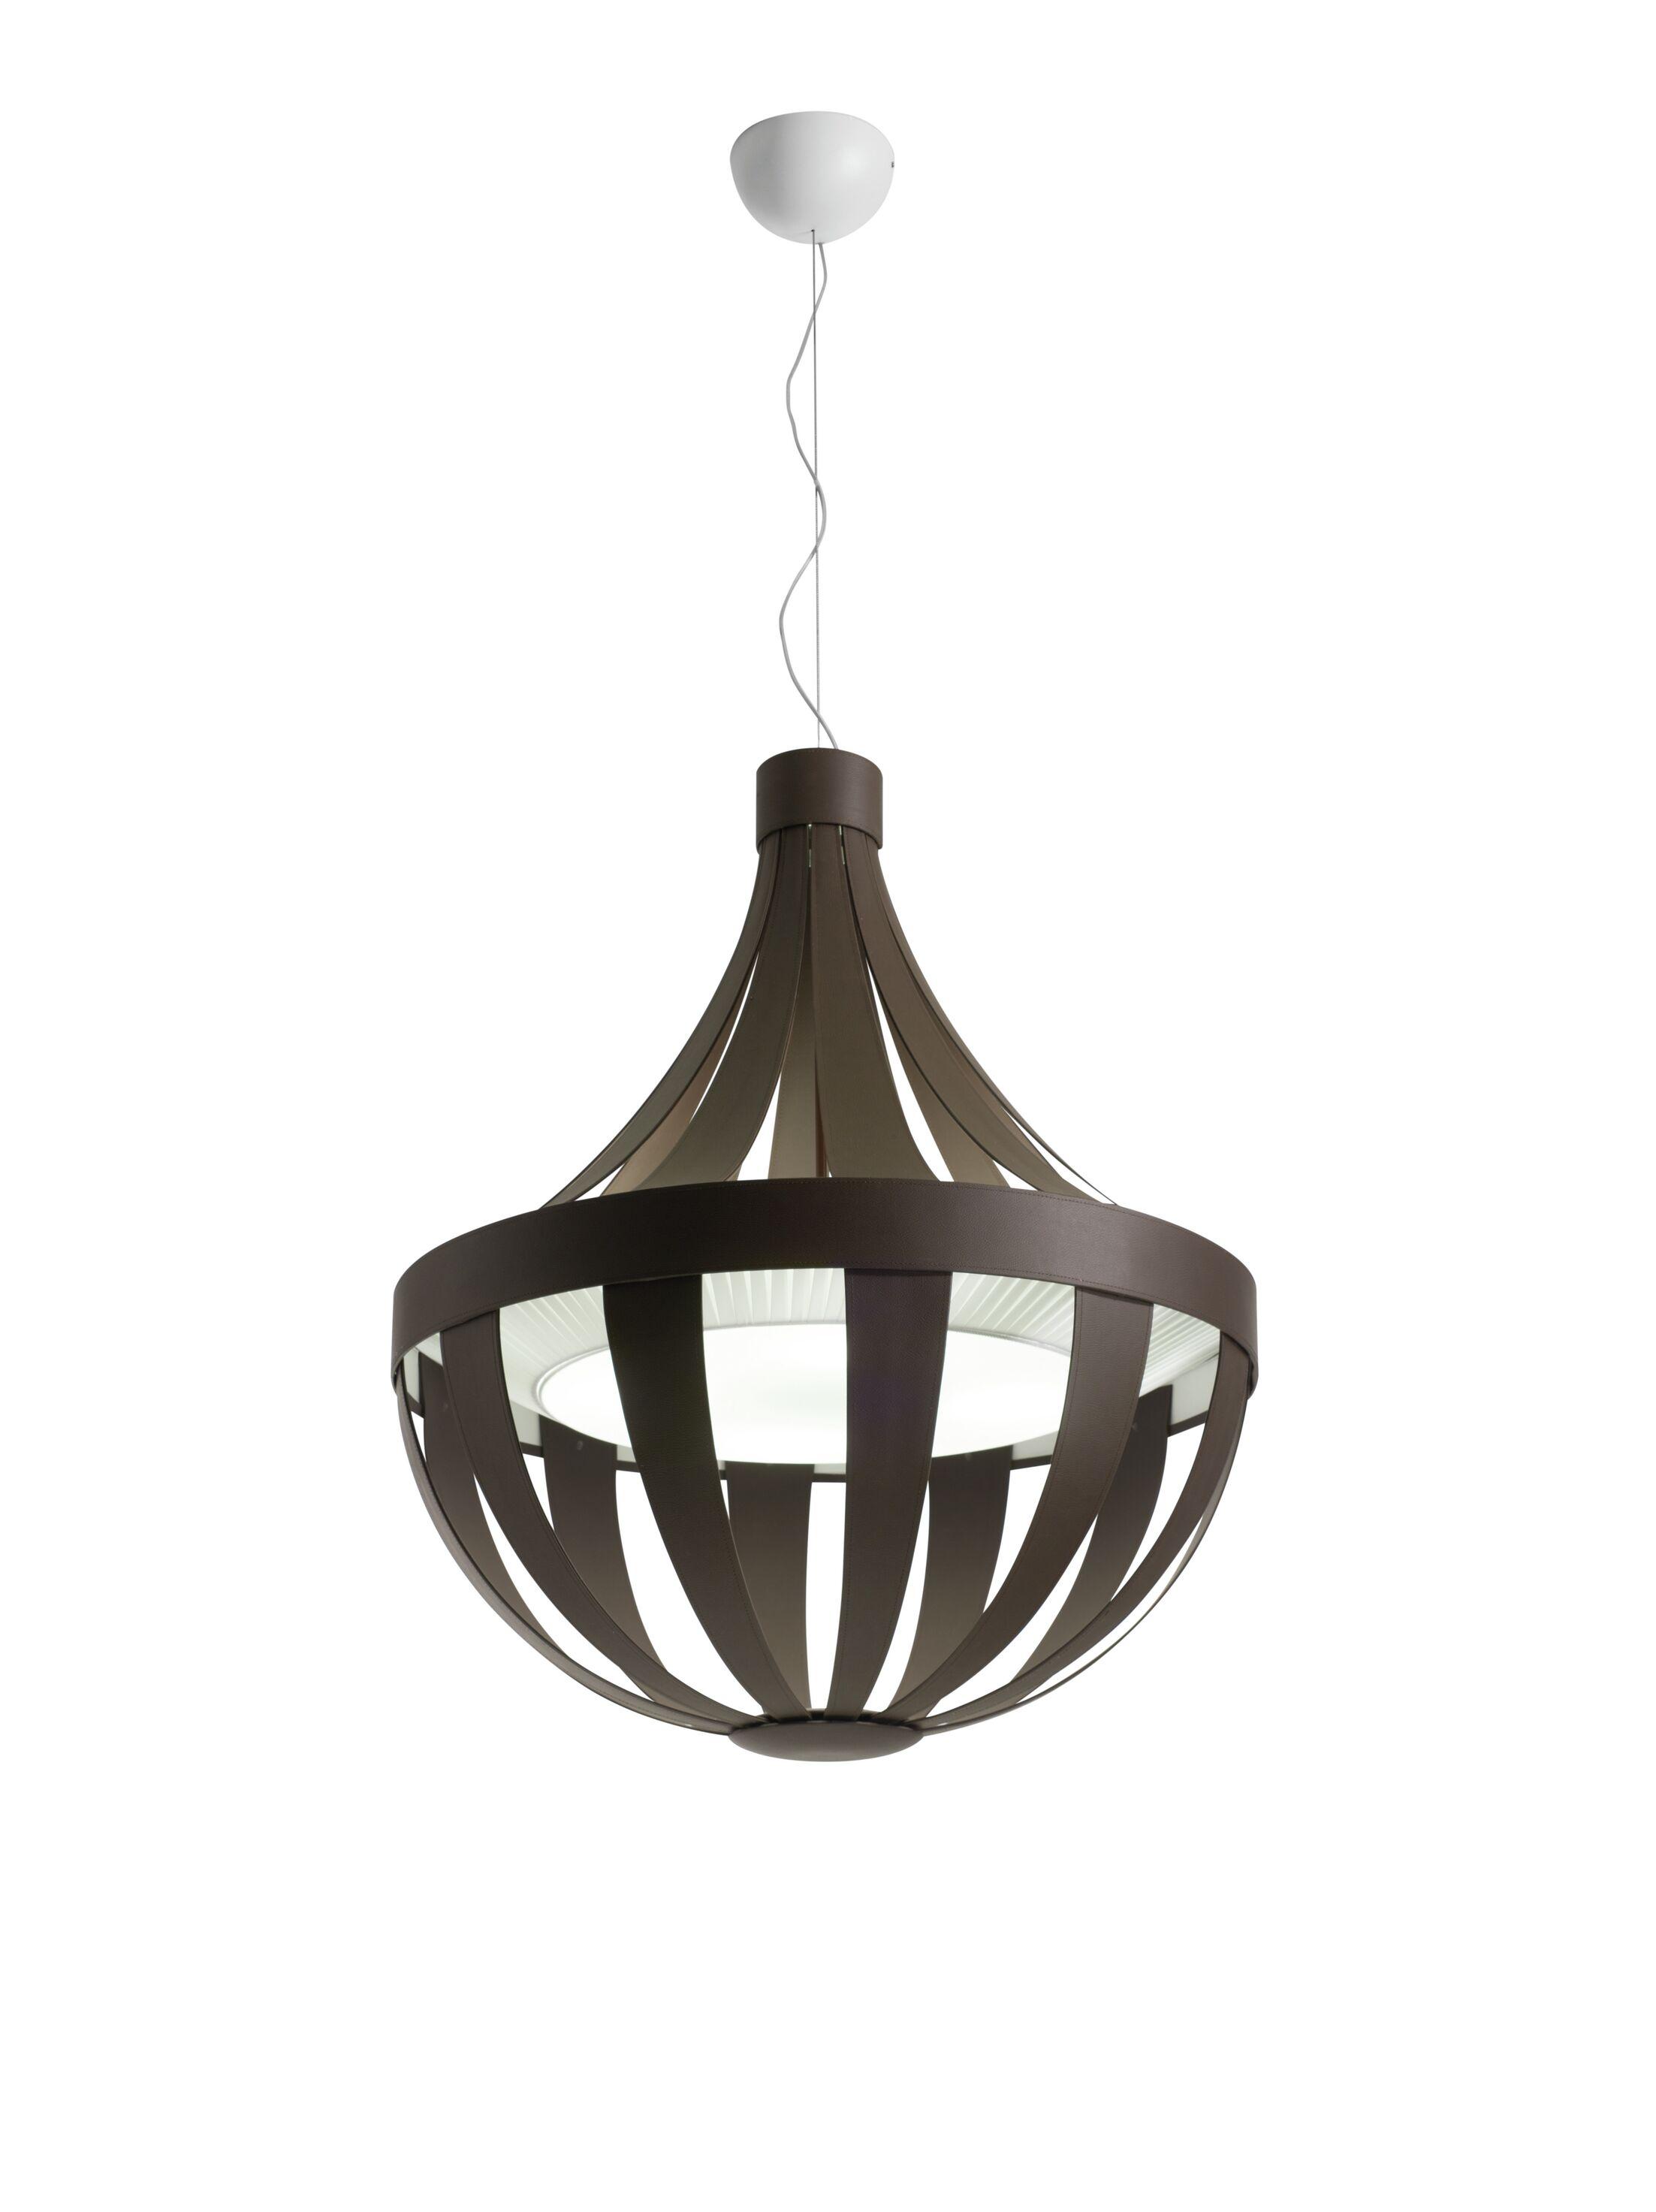 Anadem 4-Light Empire Chandelier Shade Color: Brown, Bulb Type: Incandescent